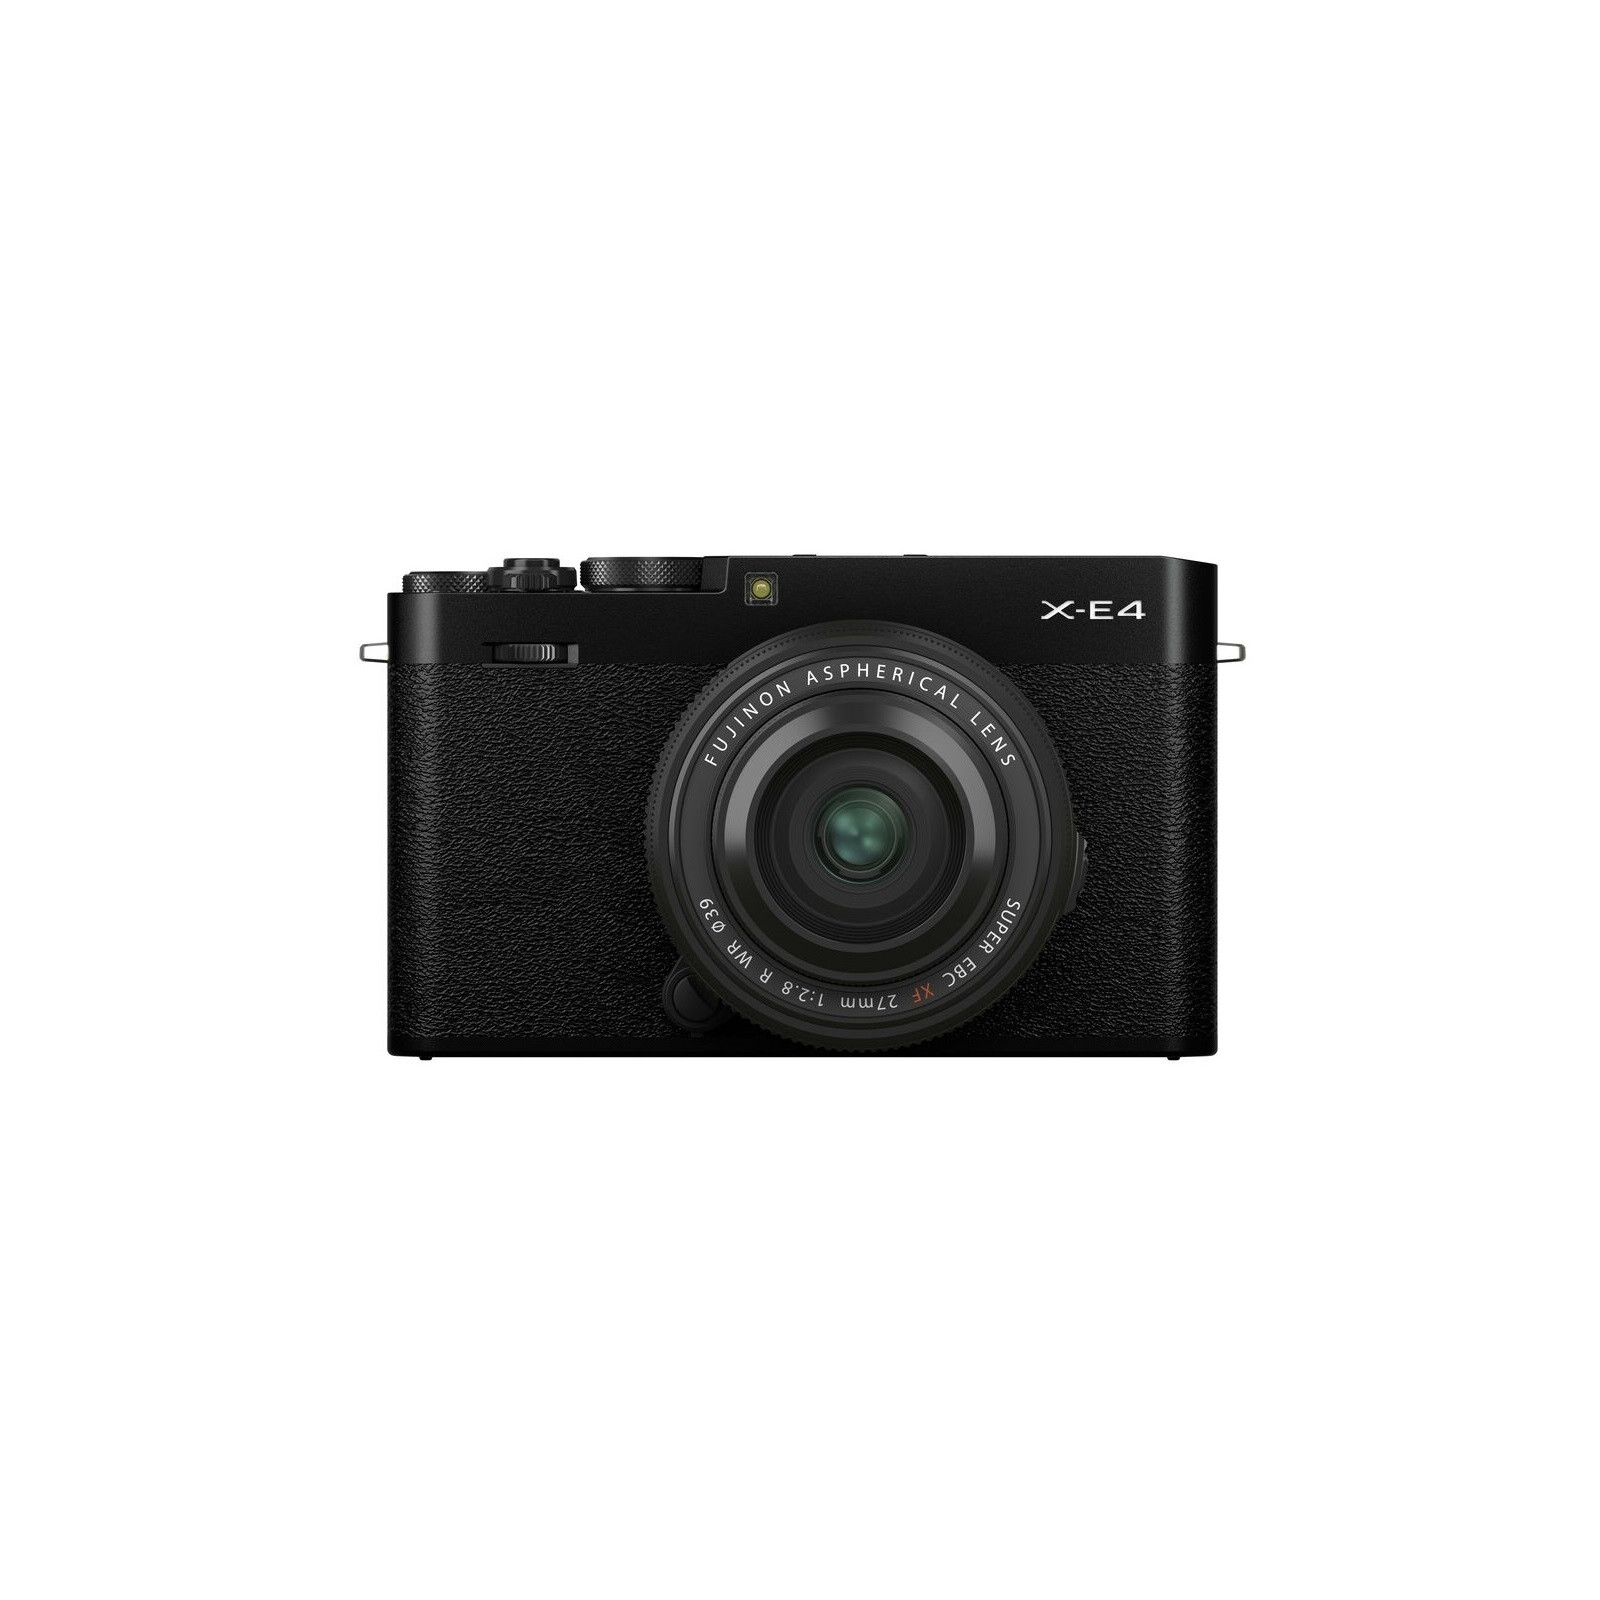 Fujifilm X-E4 black / XF27mm Kit